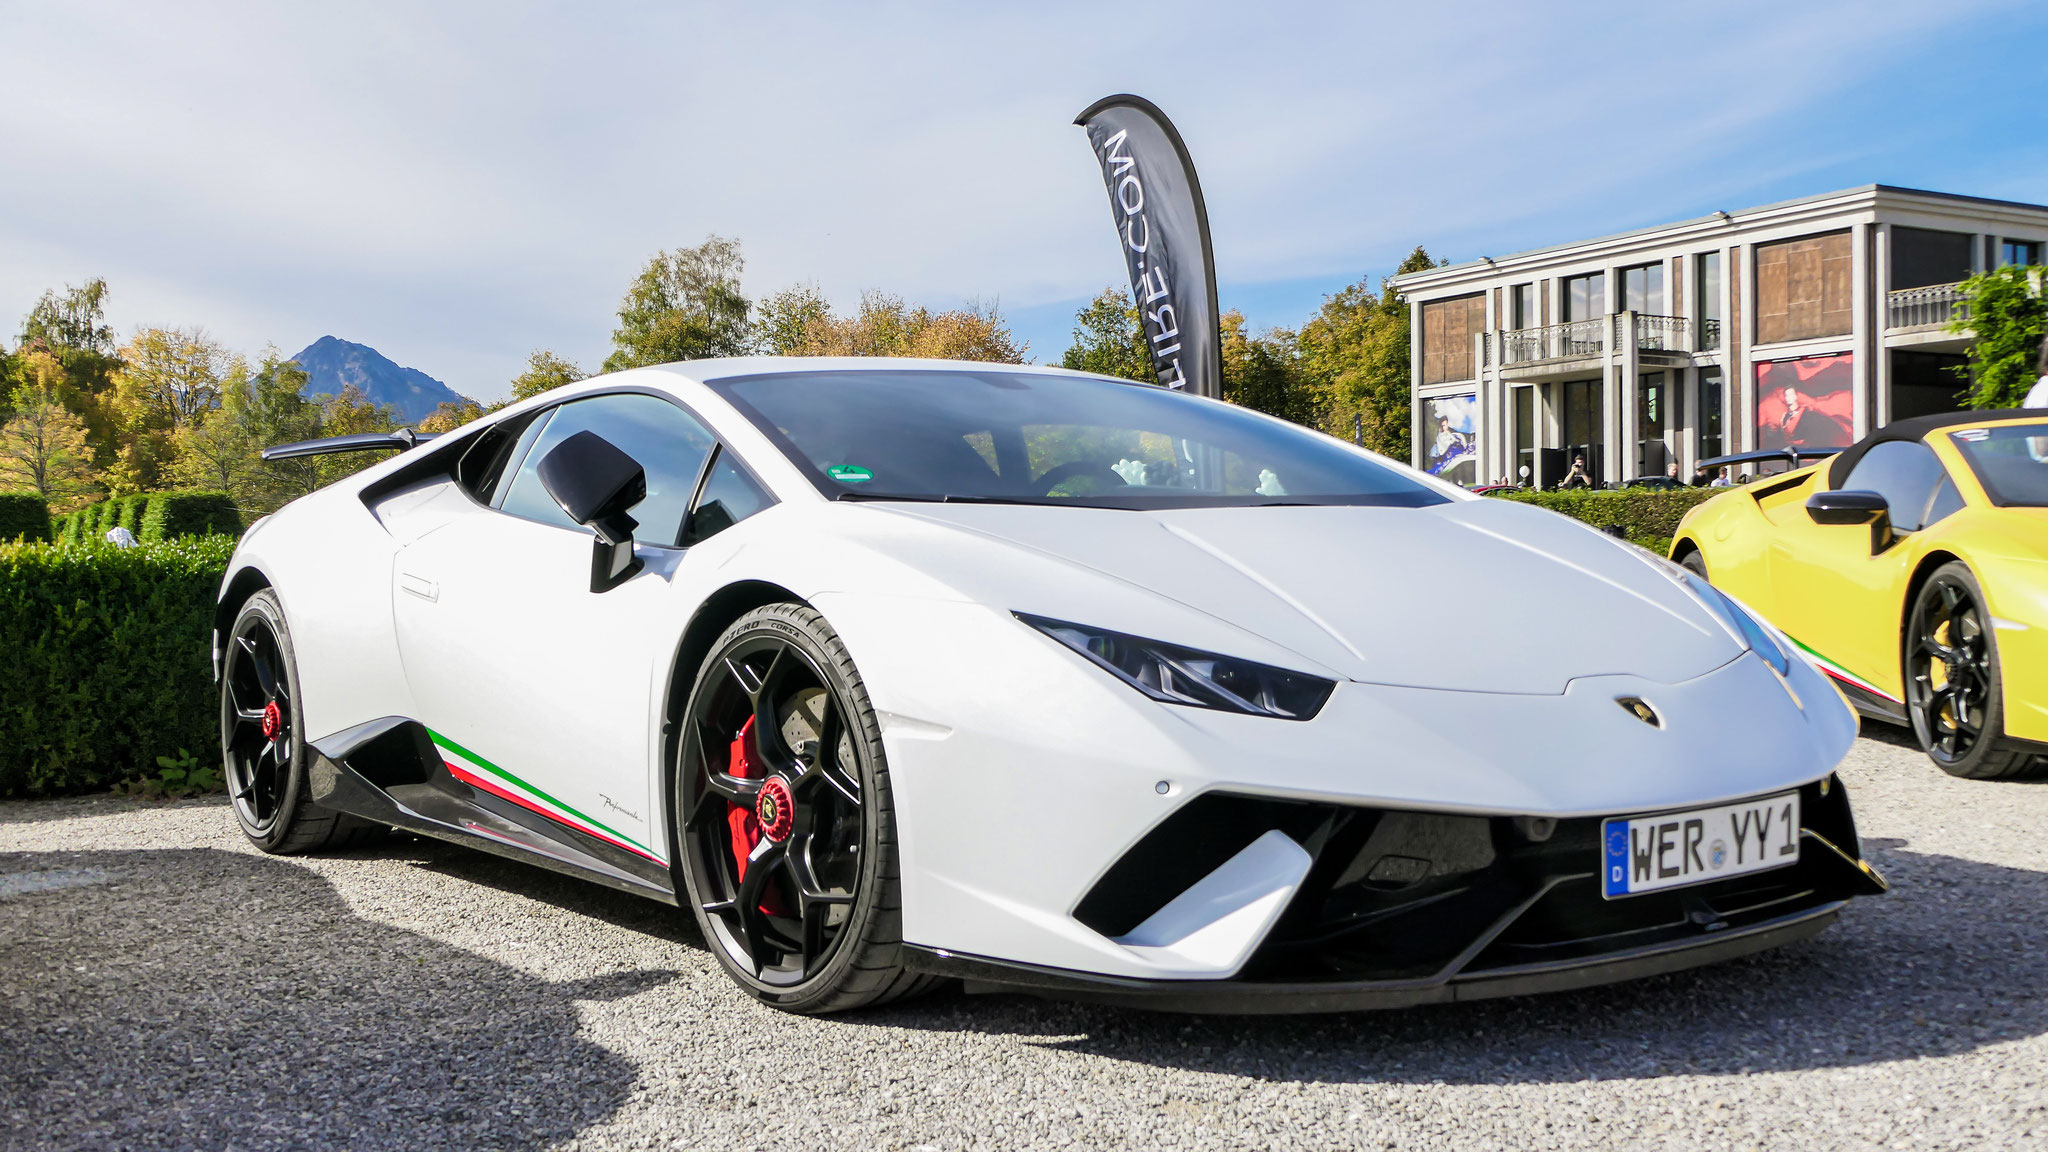 Lamborghini Huracan Performante - WER-YY-1